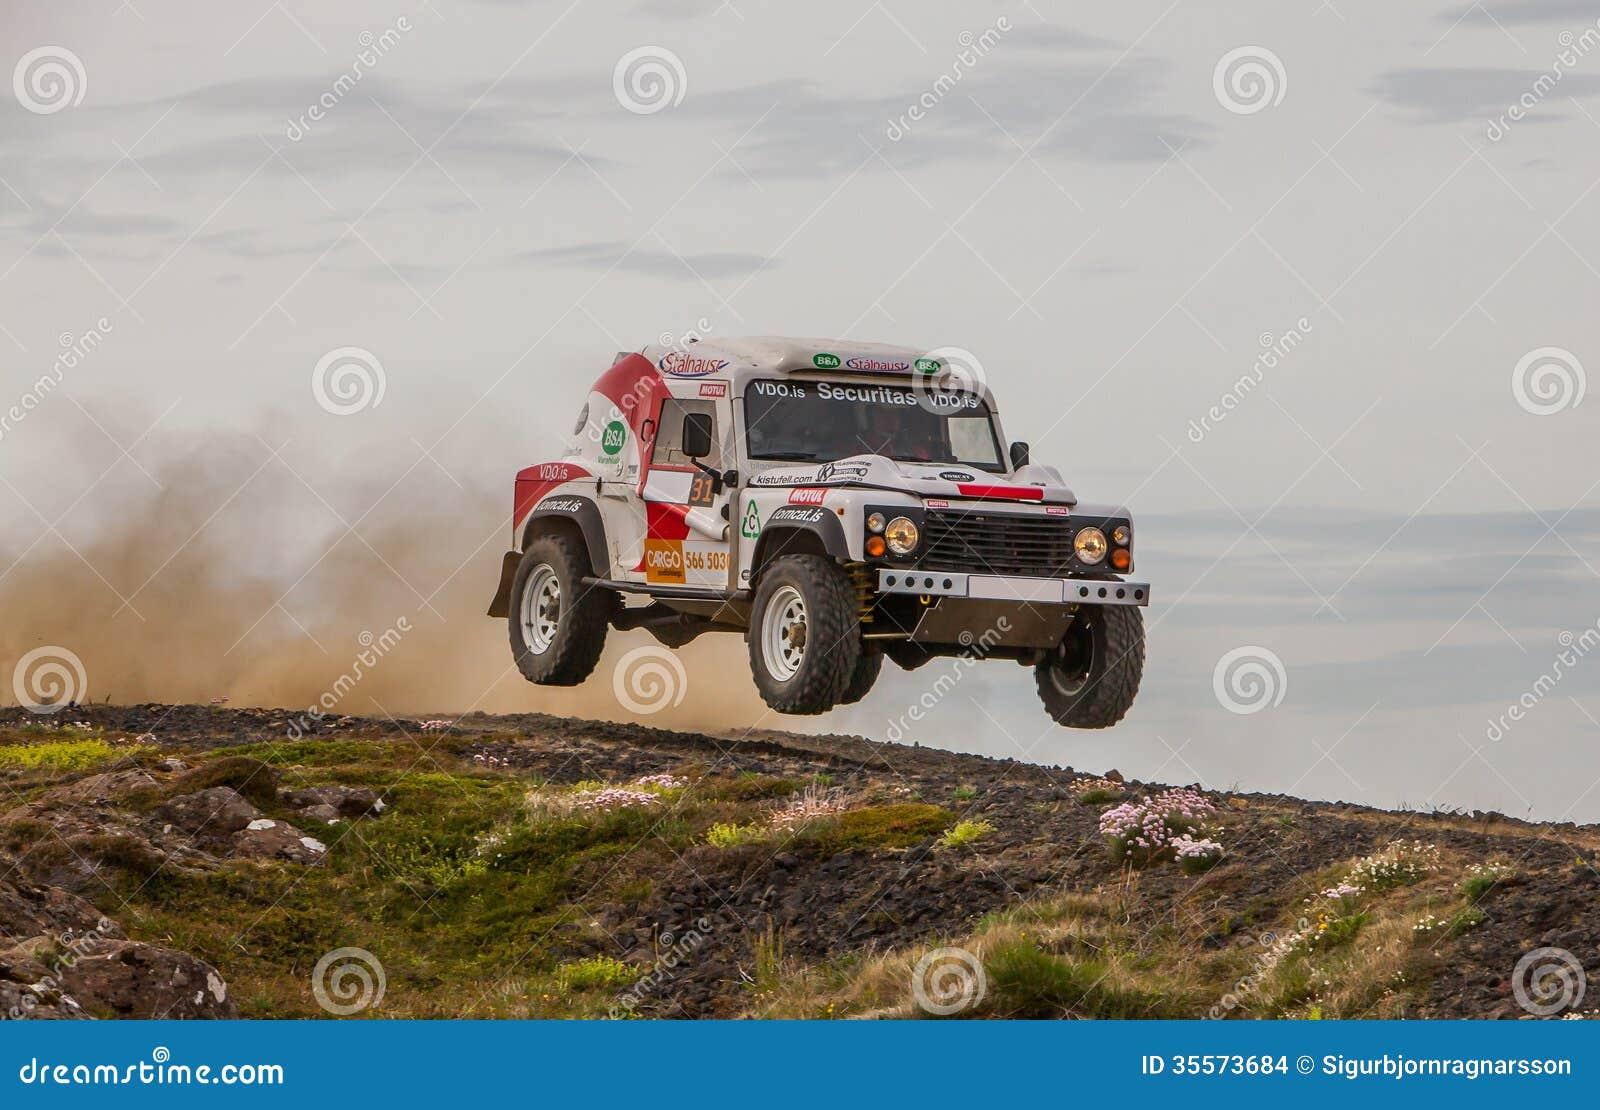 Tomcat Rallycar